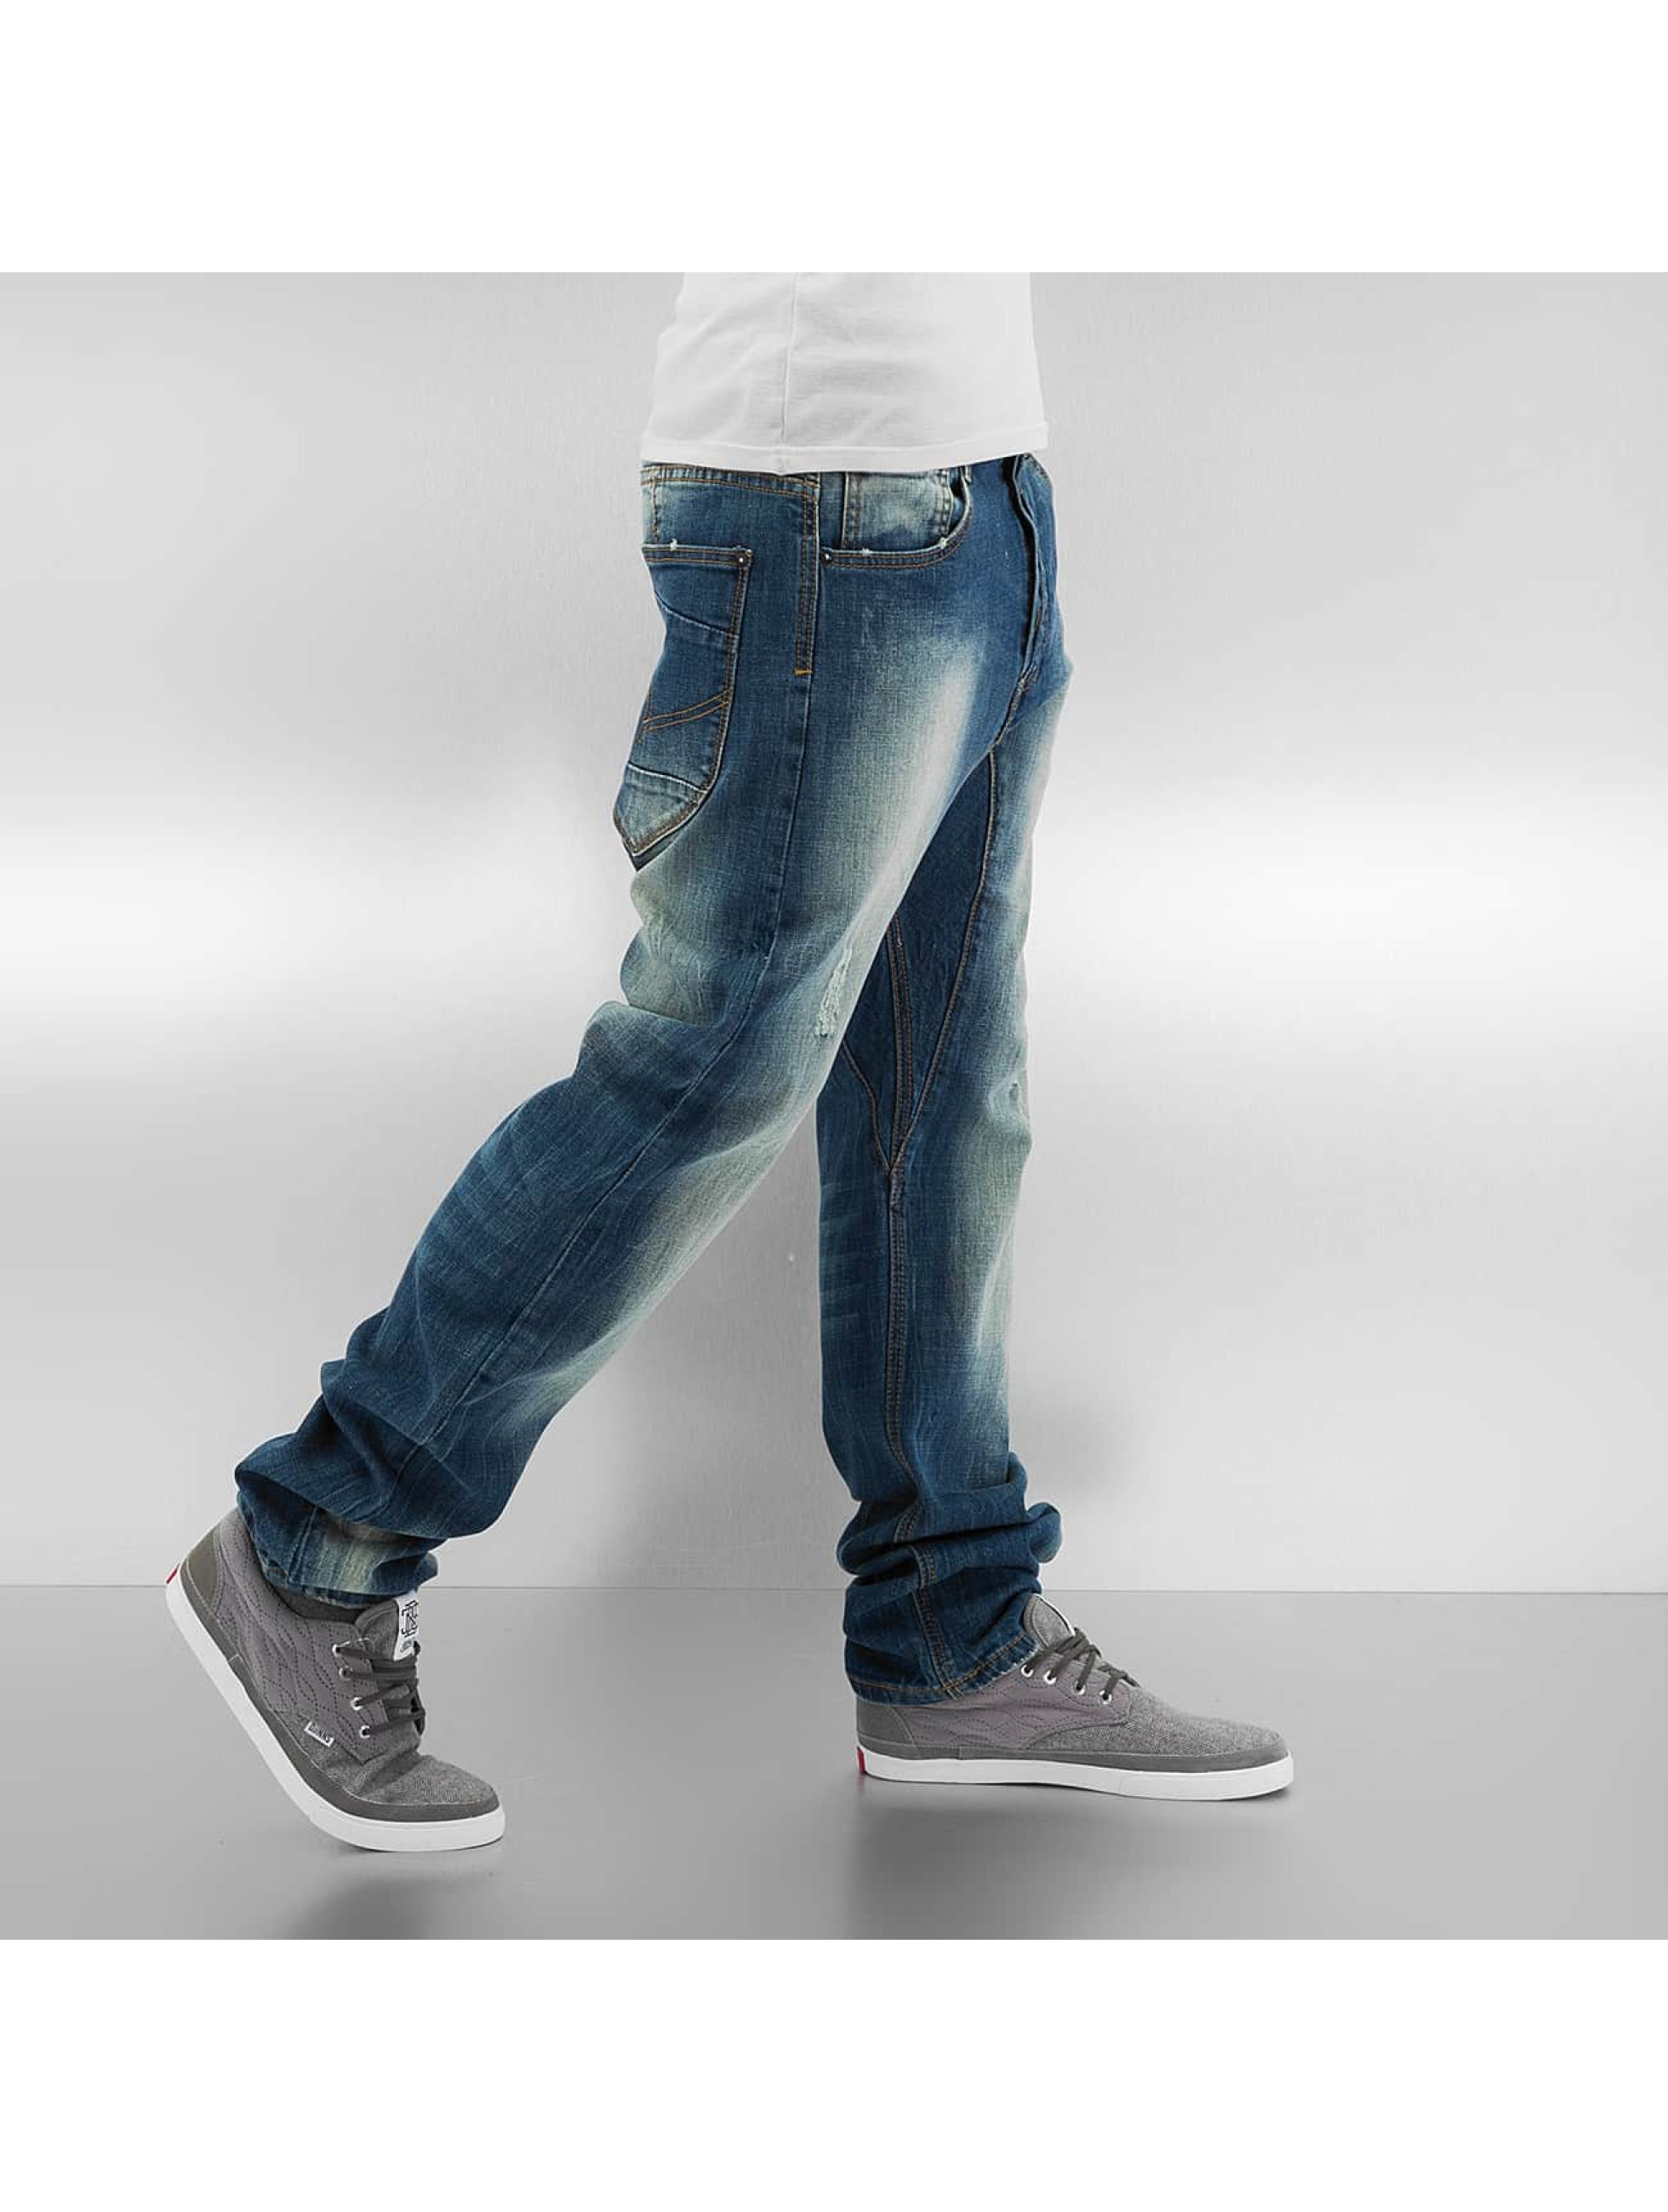 Rocawear Antifit Young Roc blau